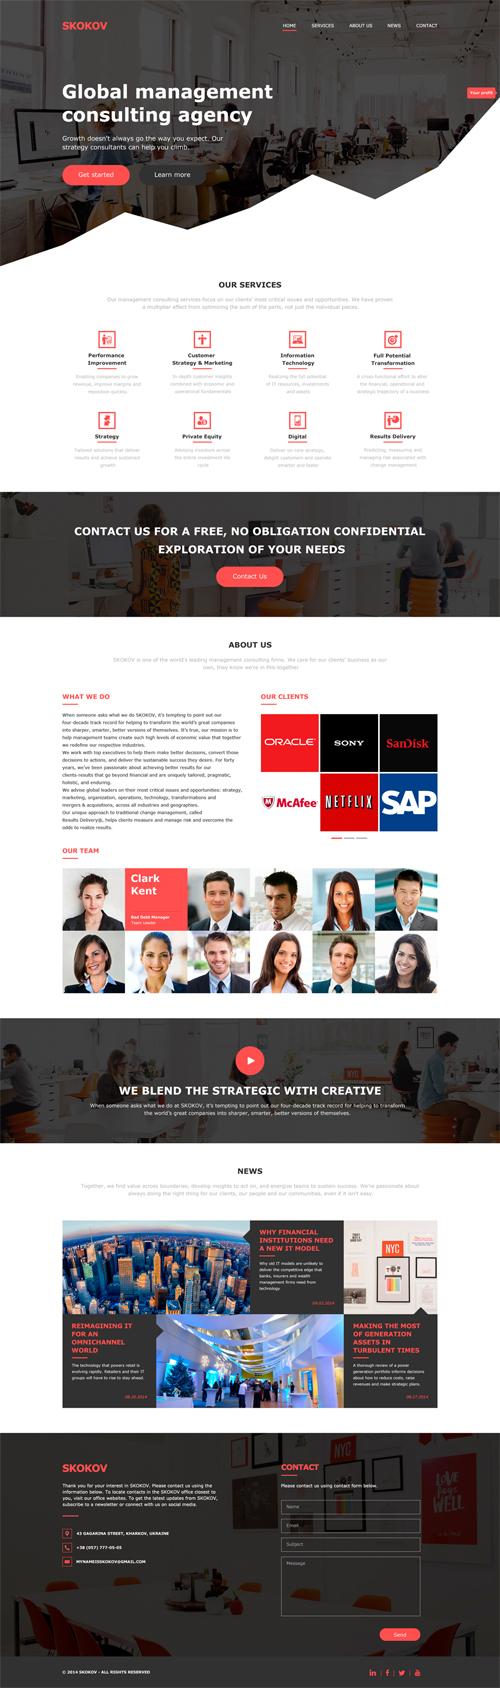 Free Business PSD Template (PSD)